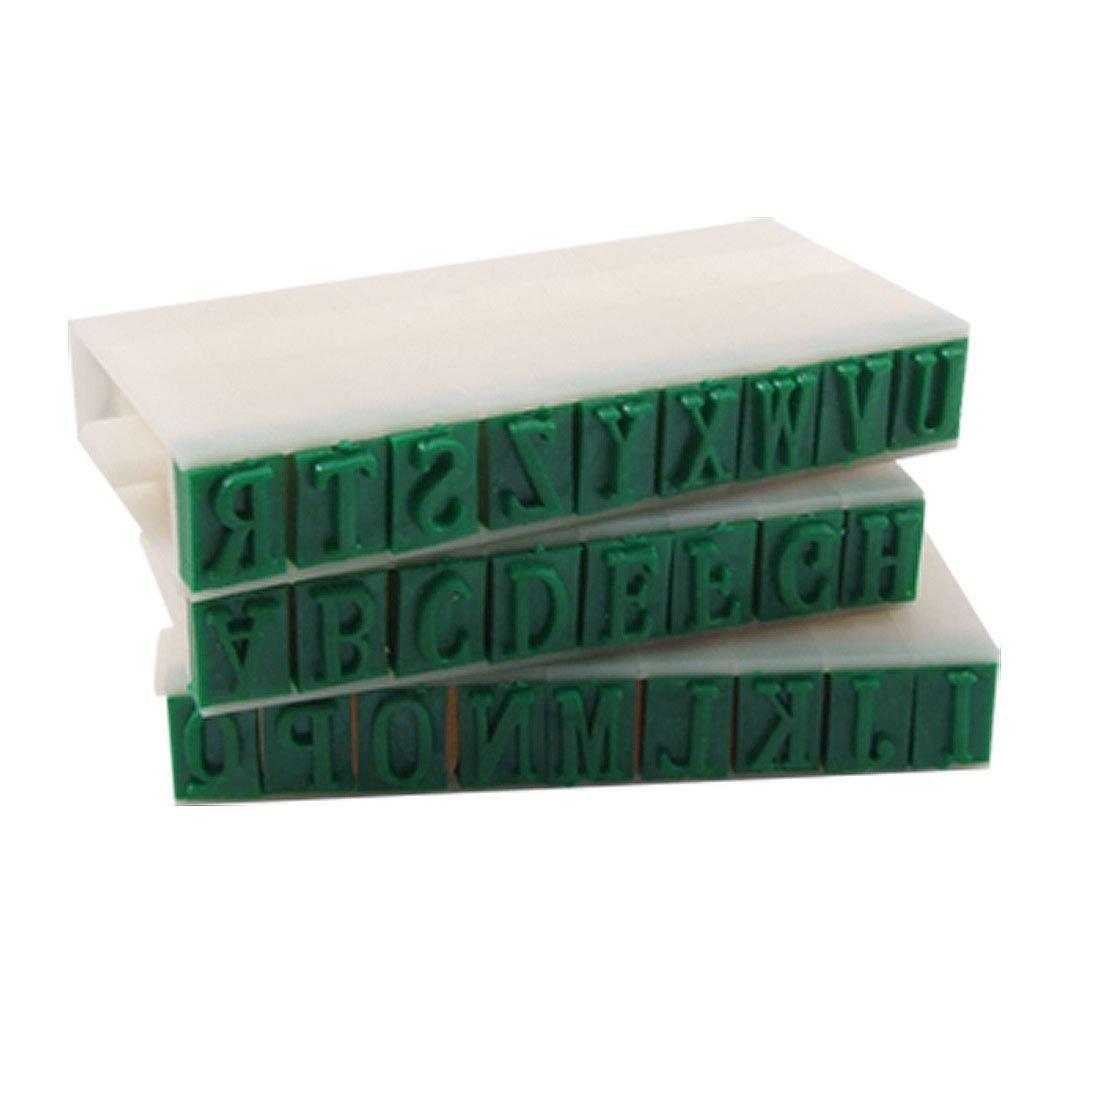 Blue 04 Length Letters Detachable 26 English Alphabet Stamp Set N3 888309001719